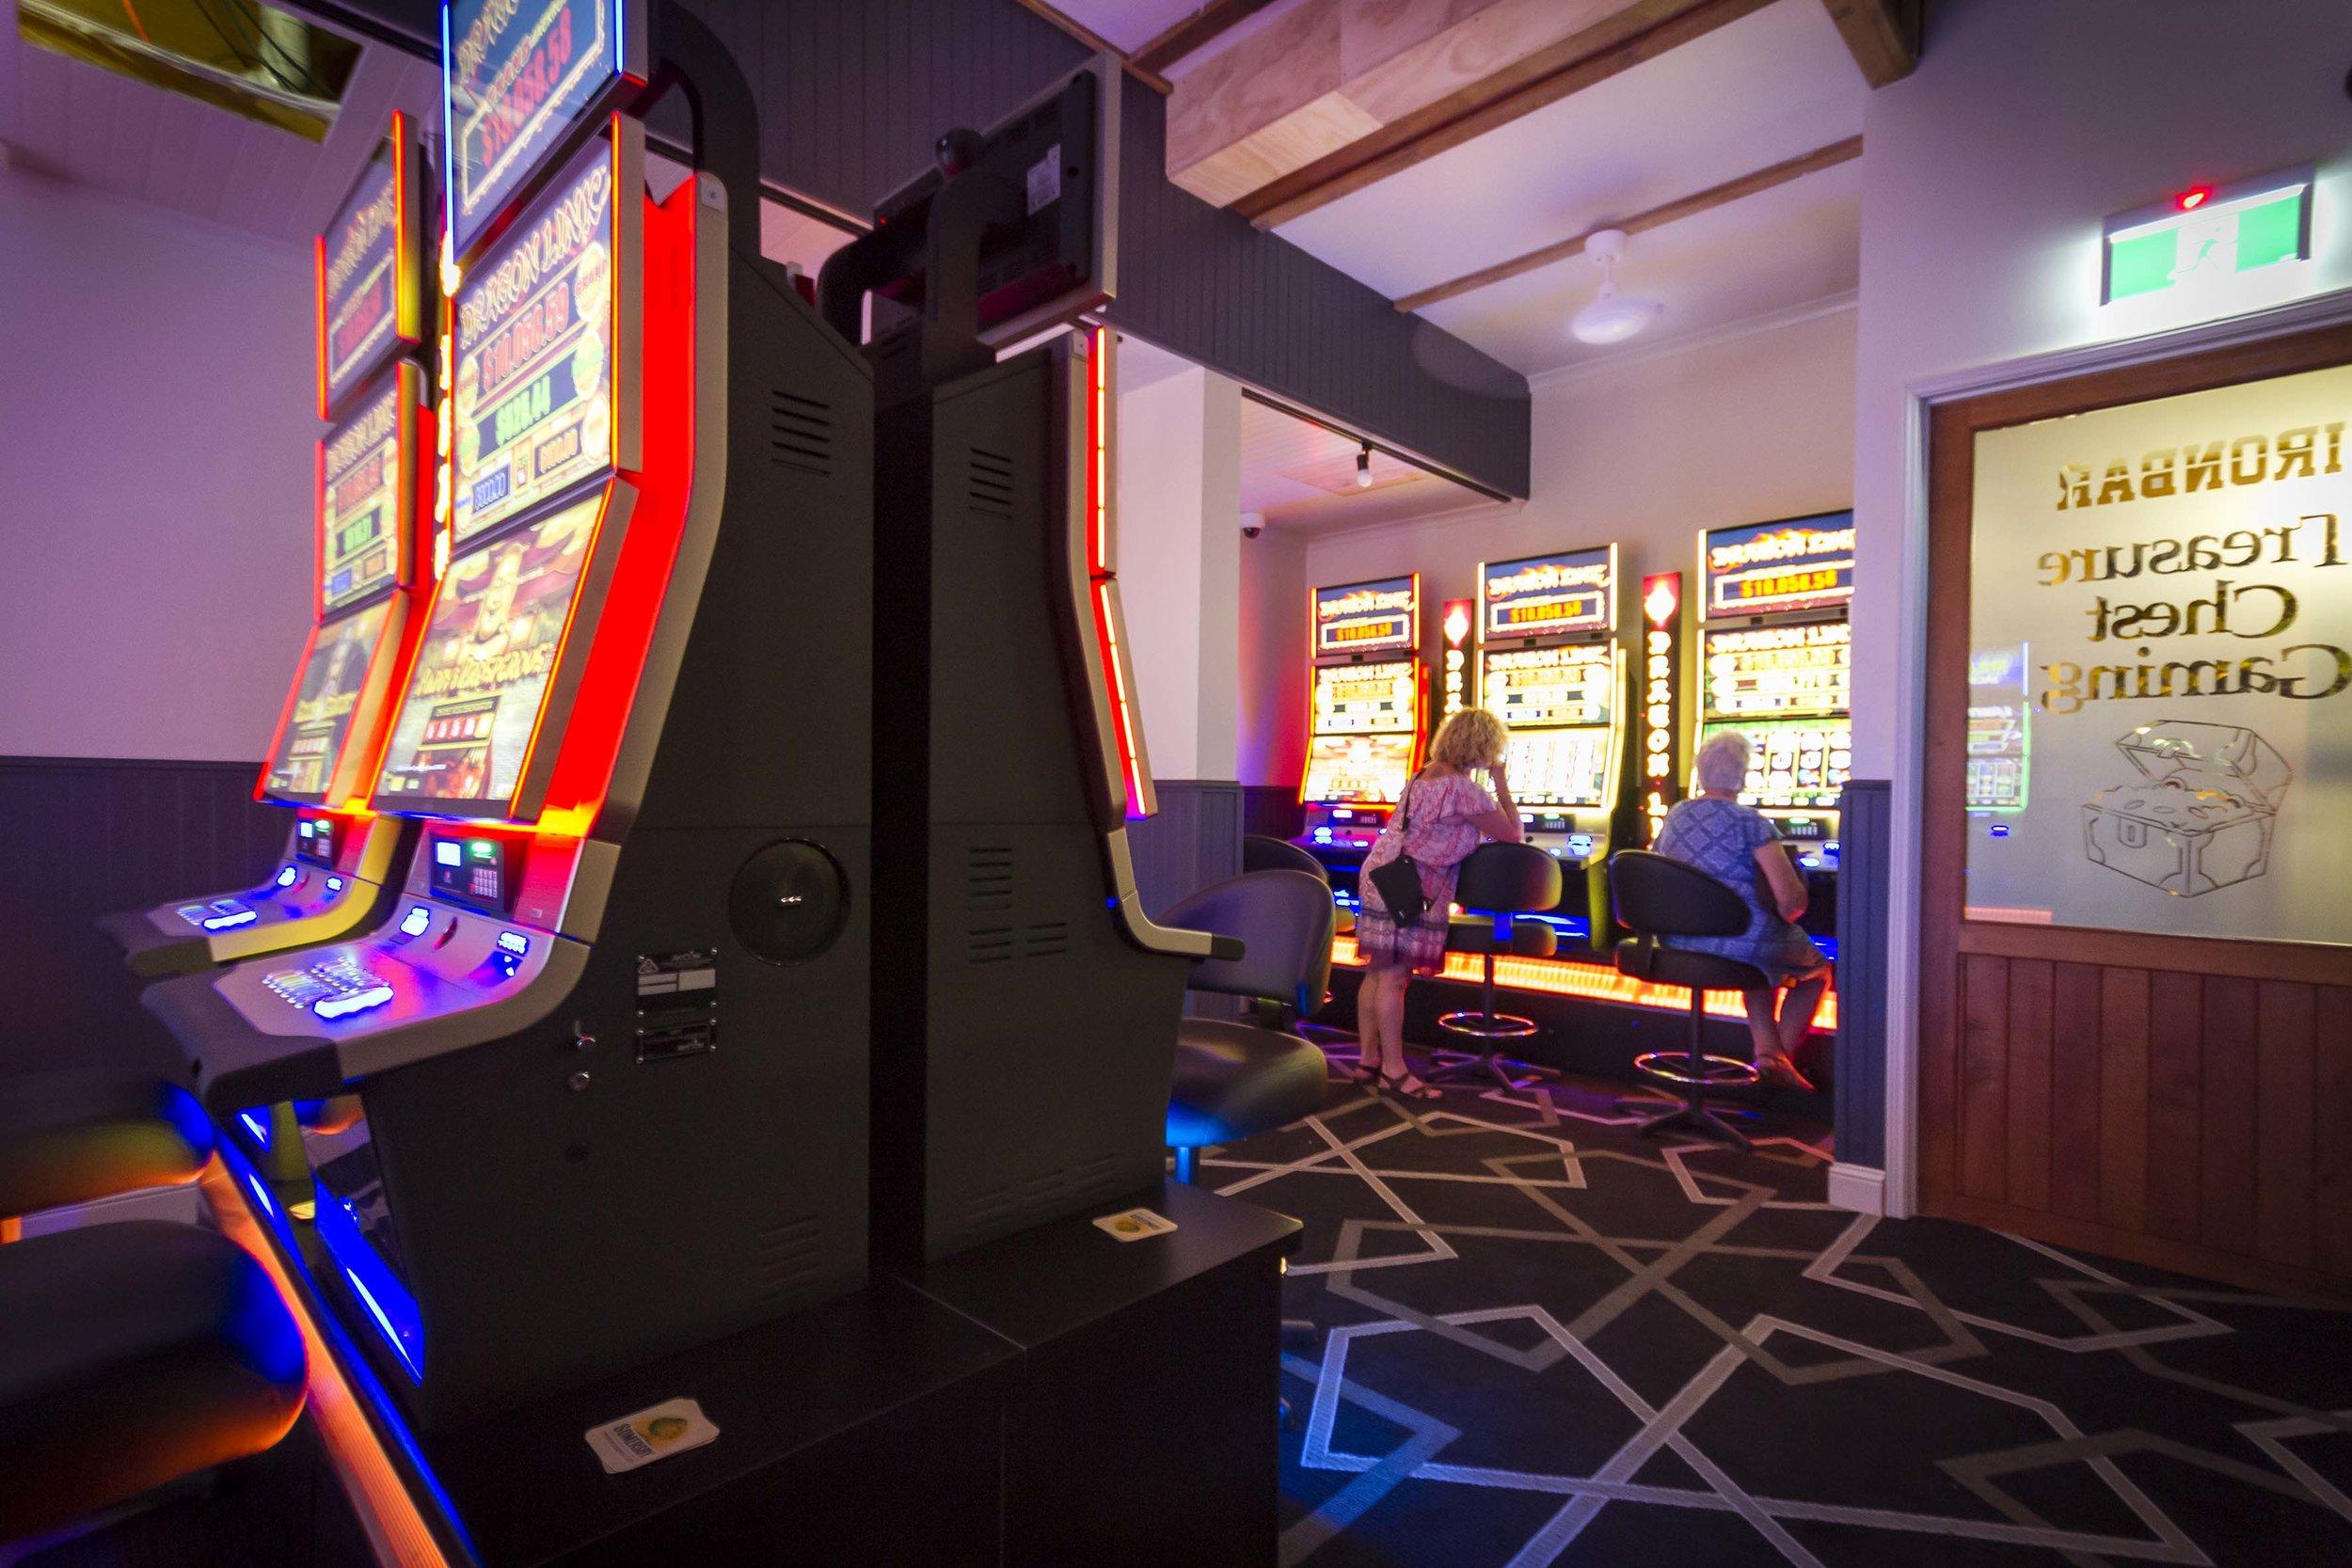 Ironbar_Gaming Lounge_Website Quality (6).jpg